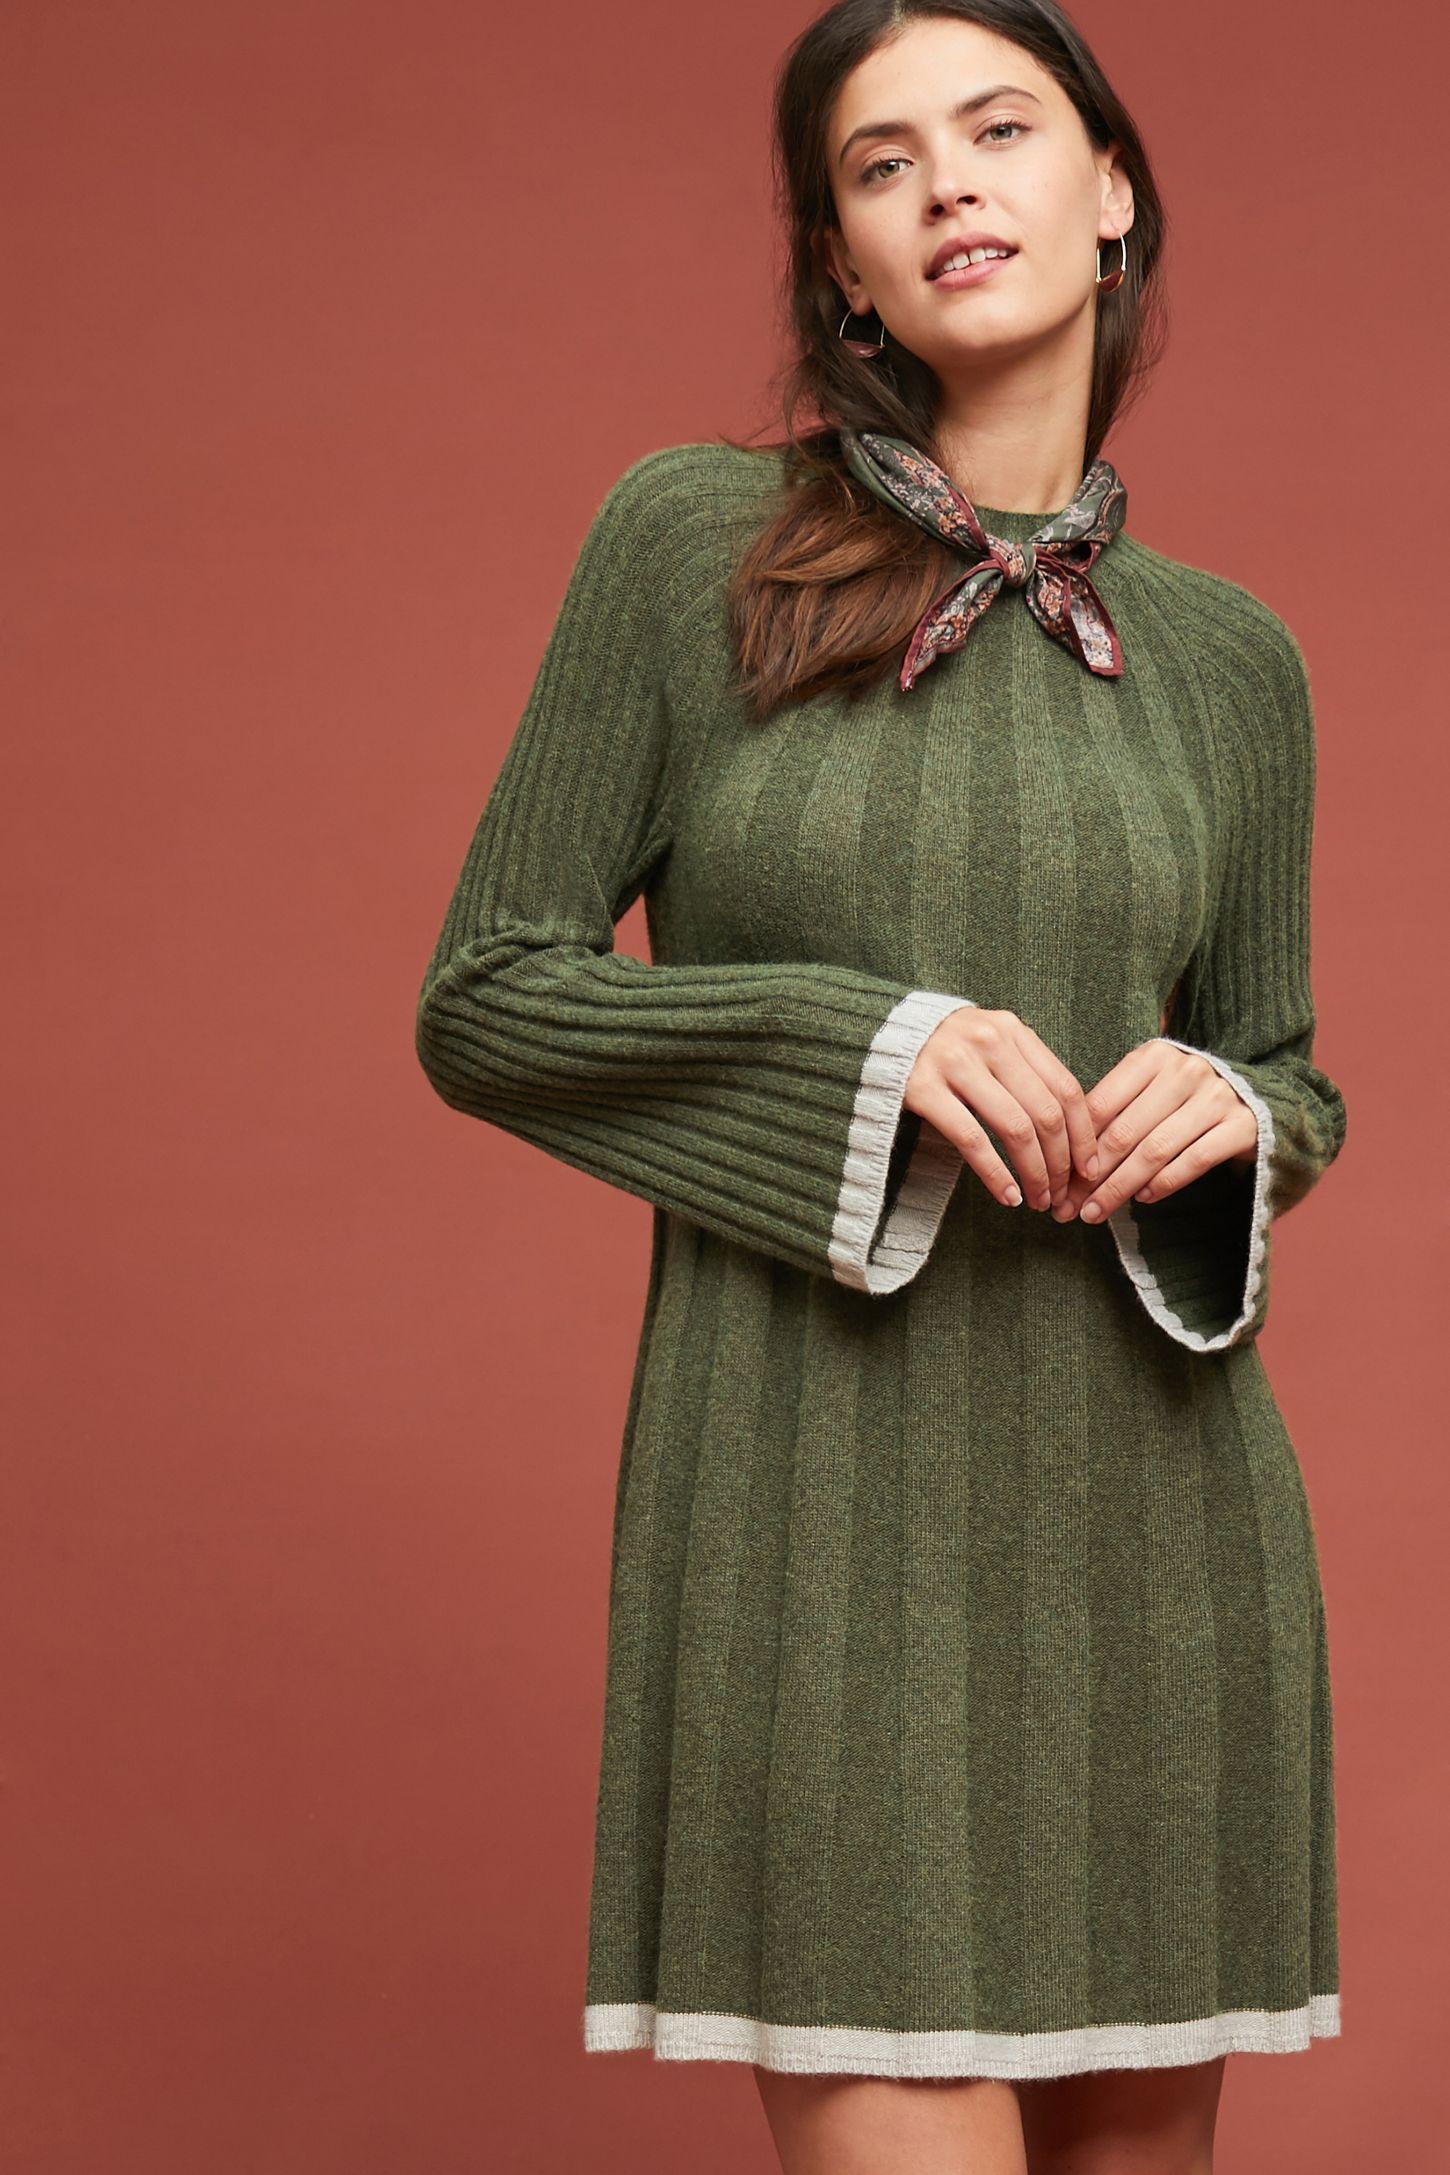 51b0c48a809ed8 Arsenau Sweater Dress